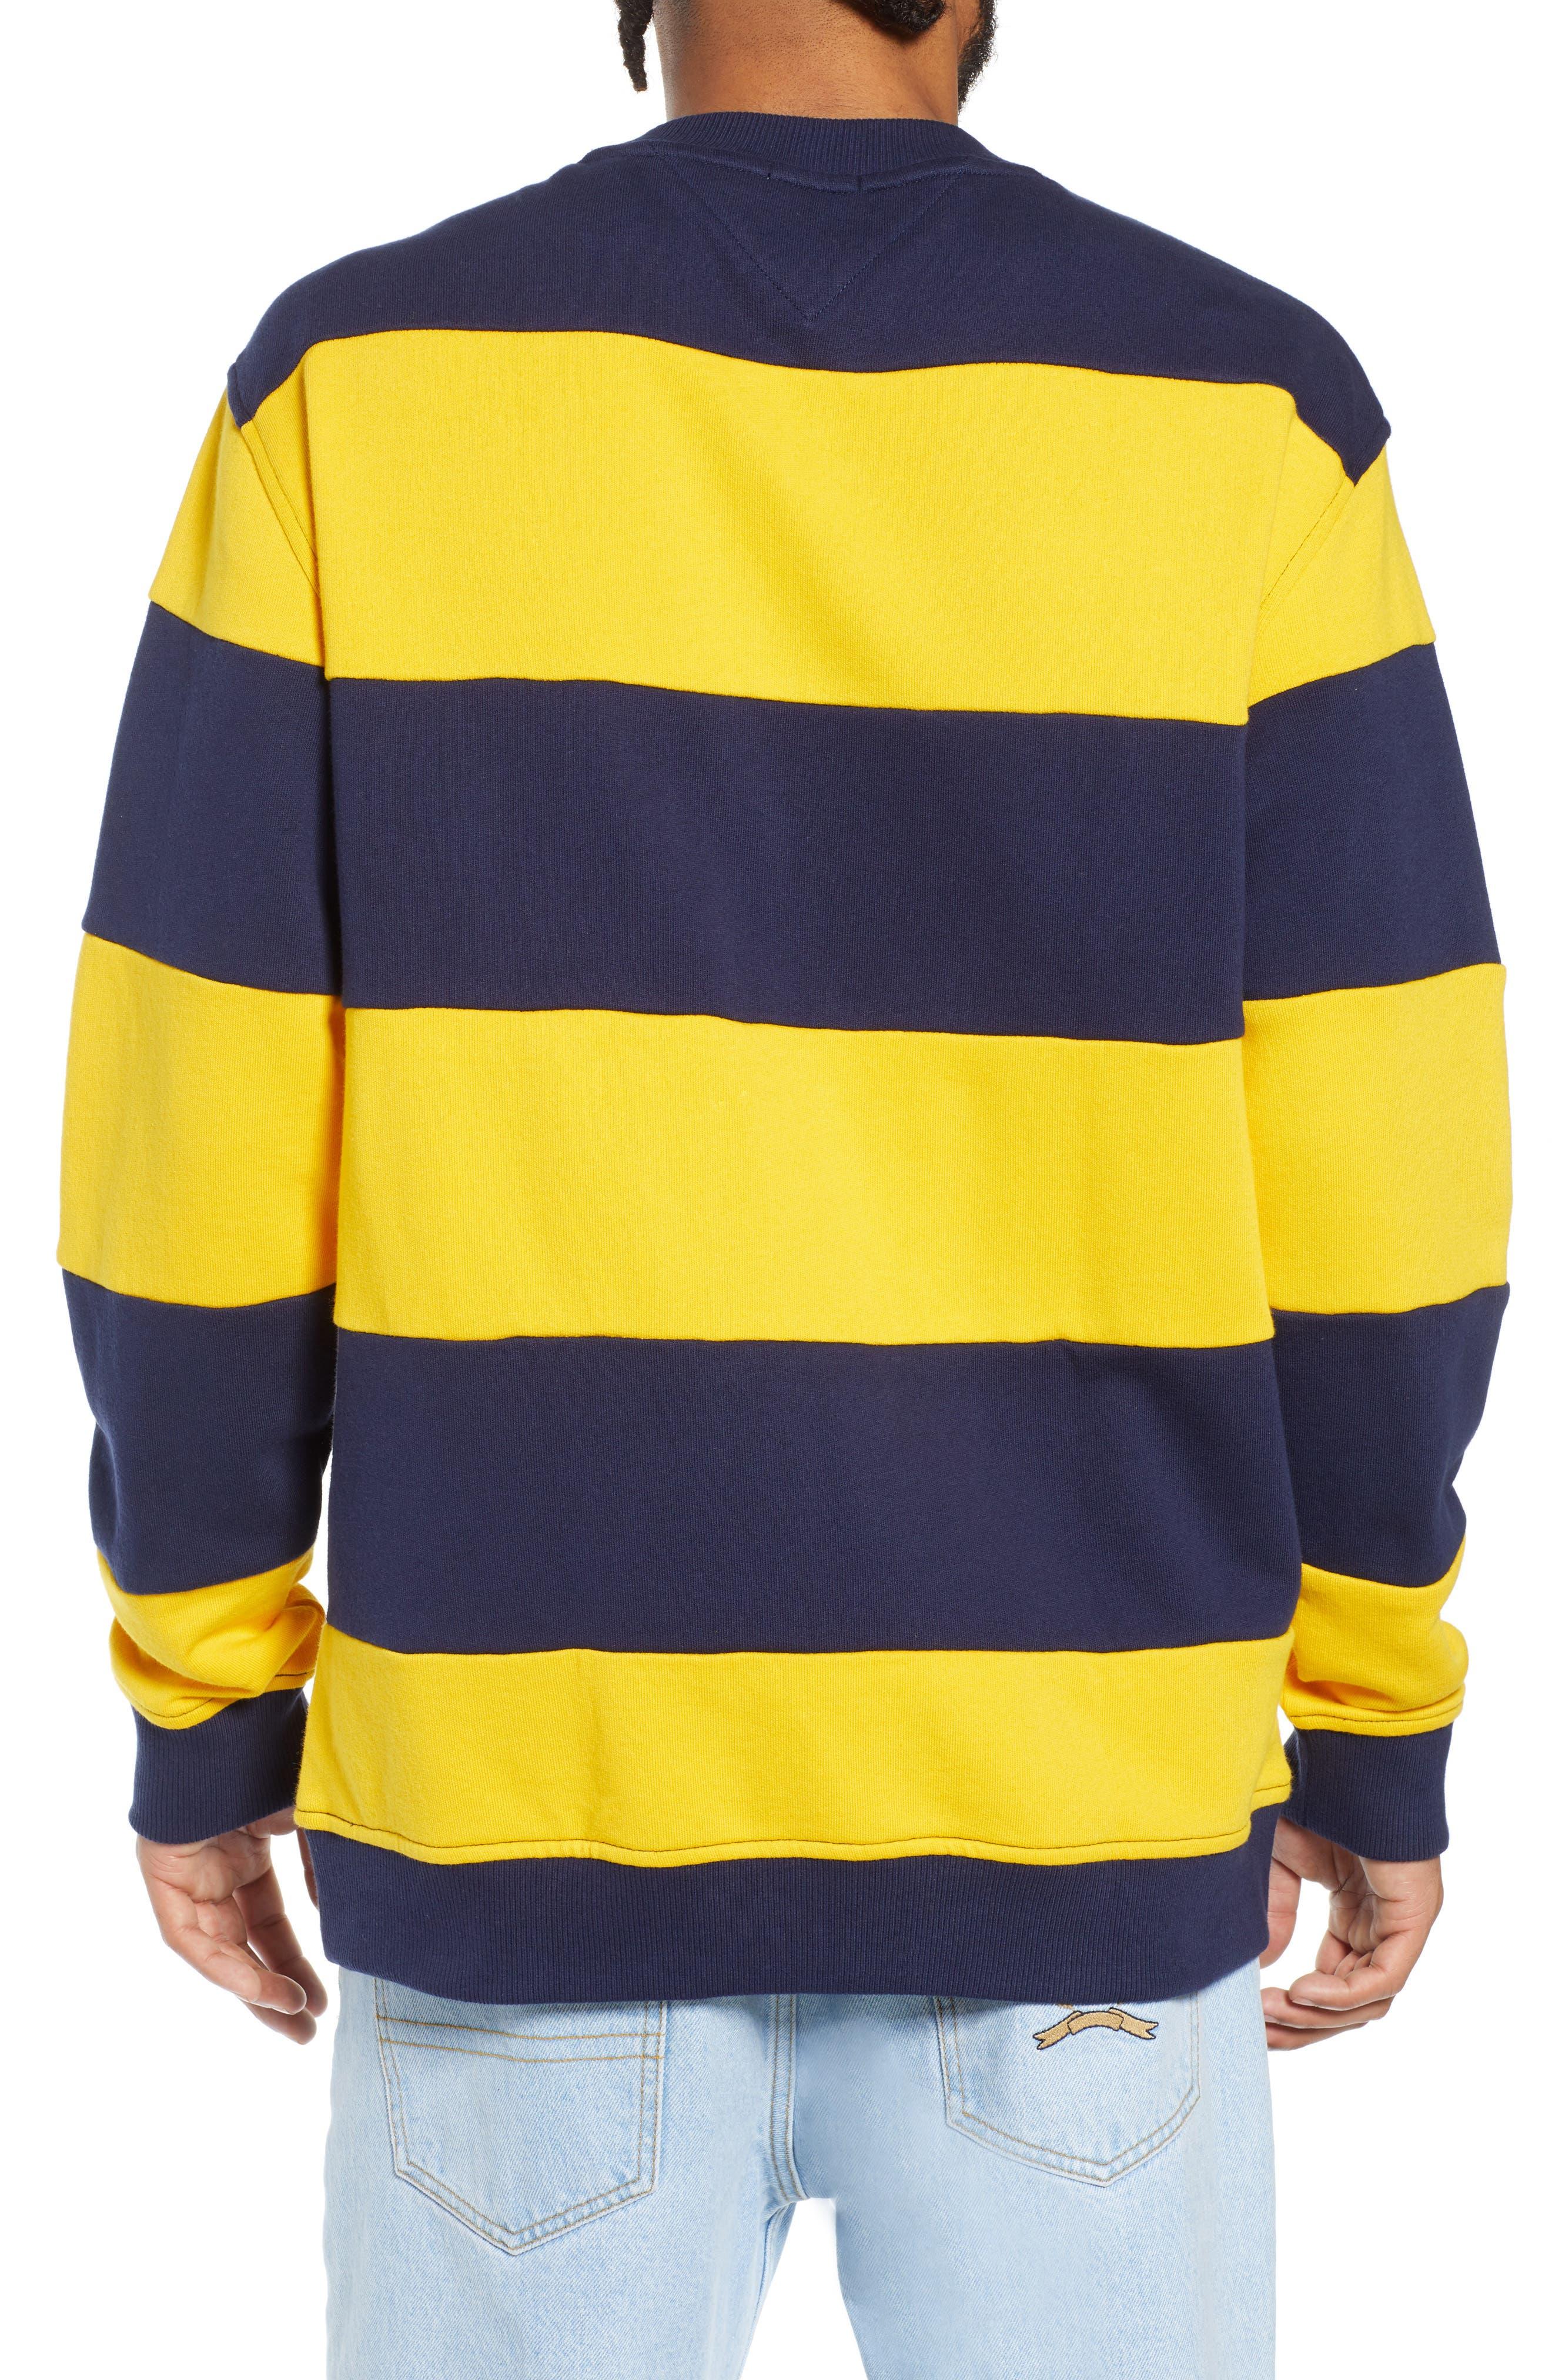 TJM Big Stripe Crew Shirt,                             Alternate thumbnail 2, color,                             BLACK IRIS / SPECTRA YELLOW